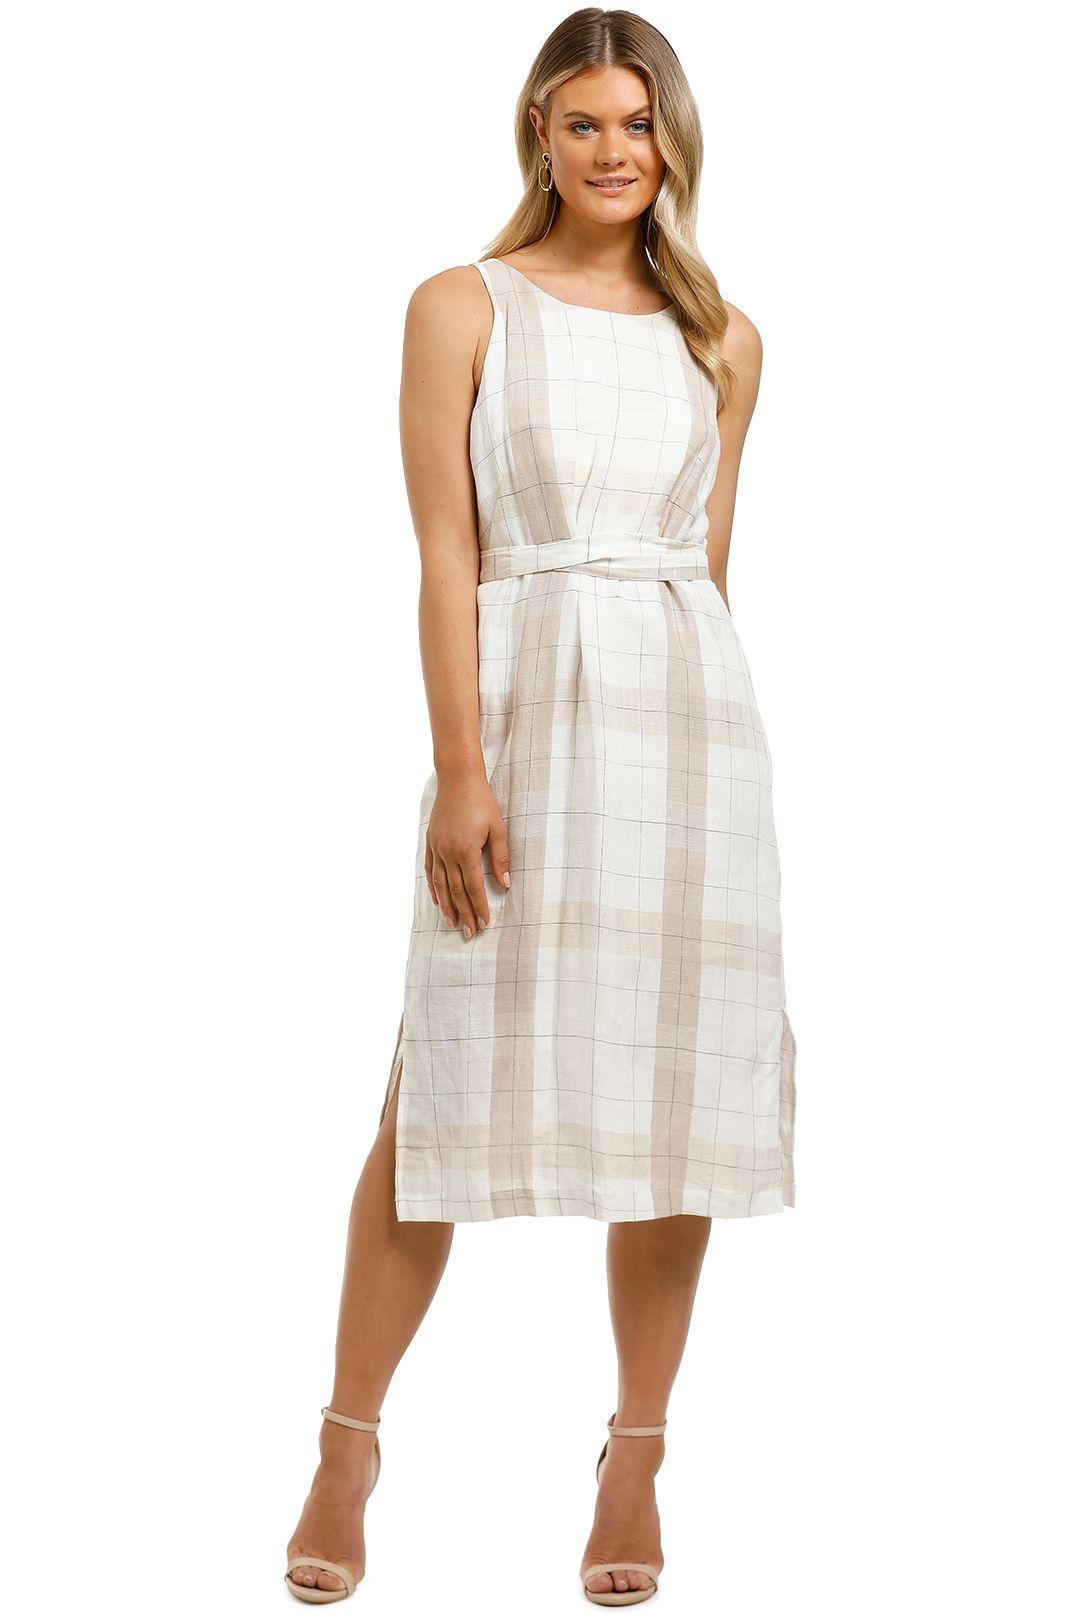 Saints-The-Label-Brighton-Dress-Stripe-Front